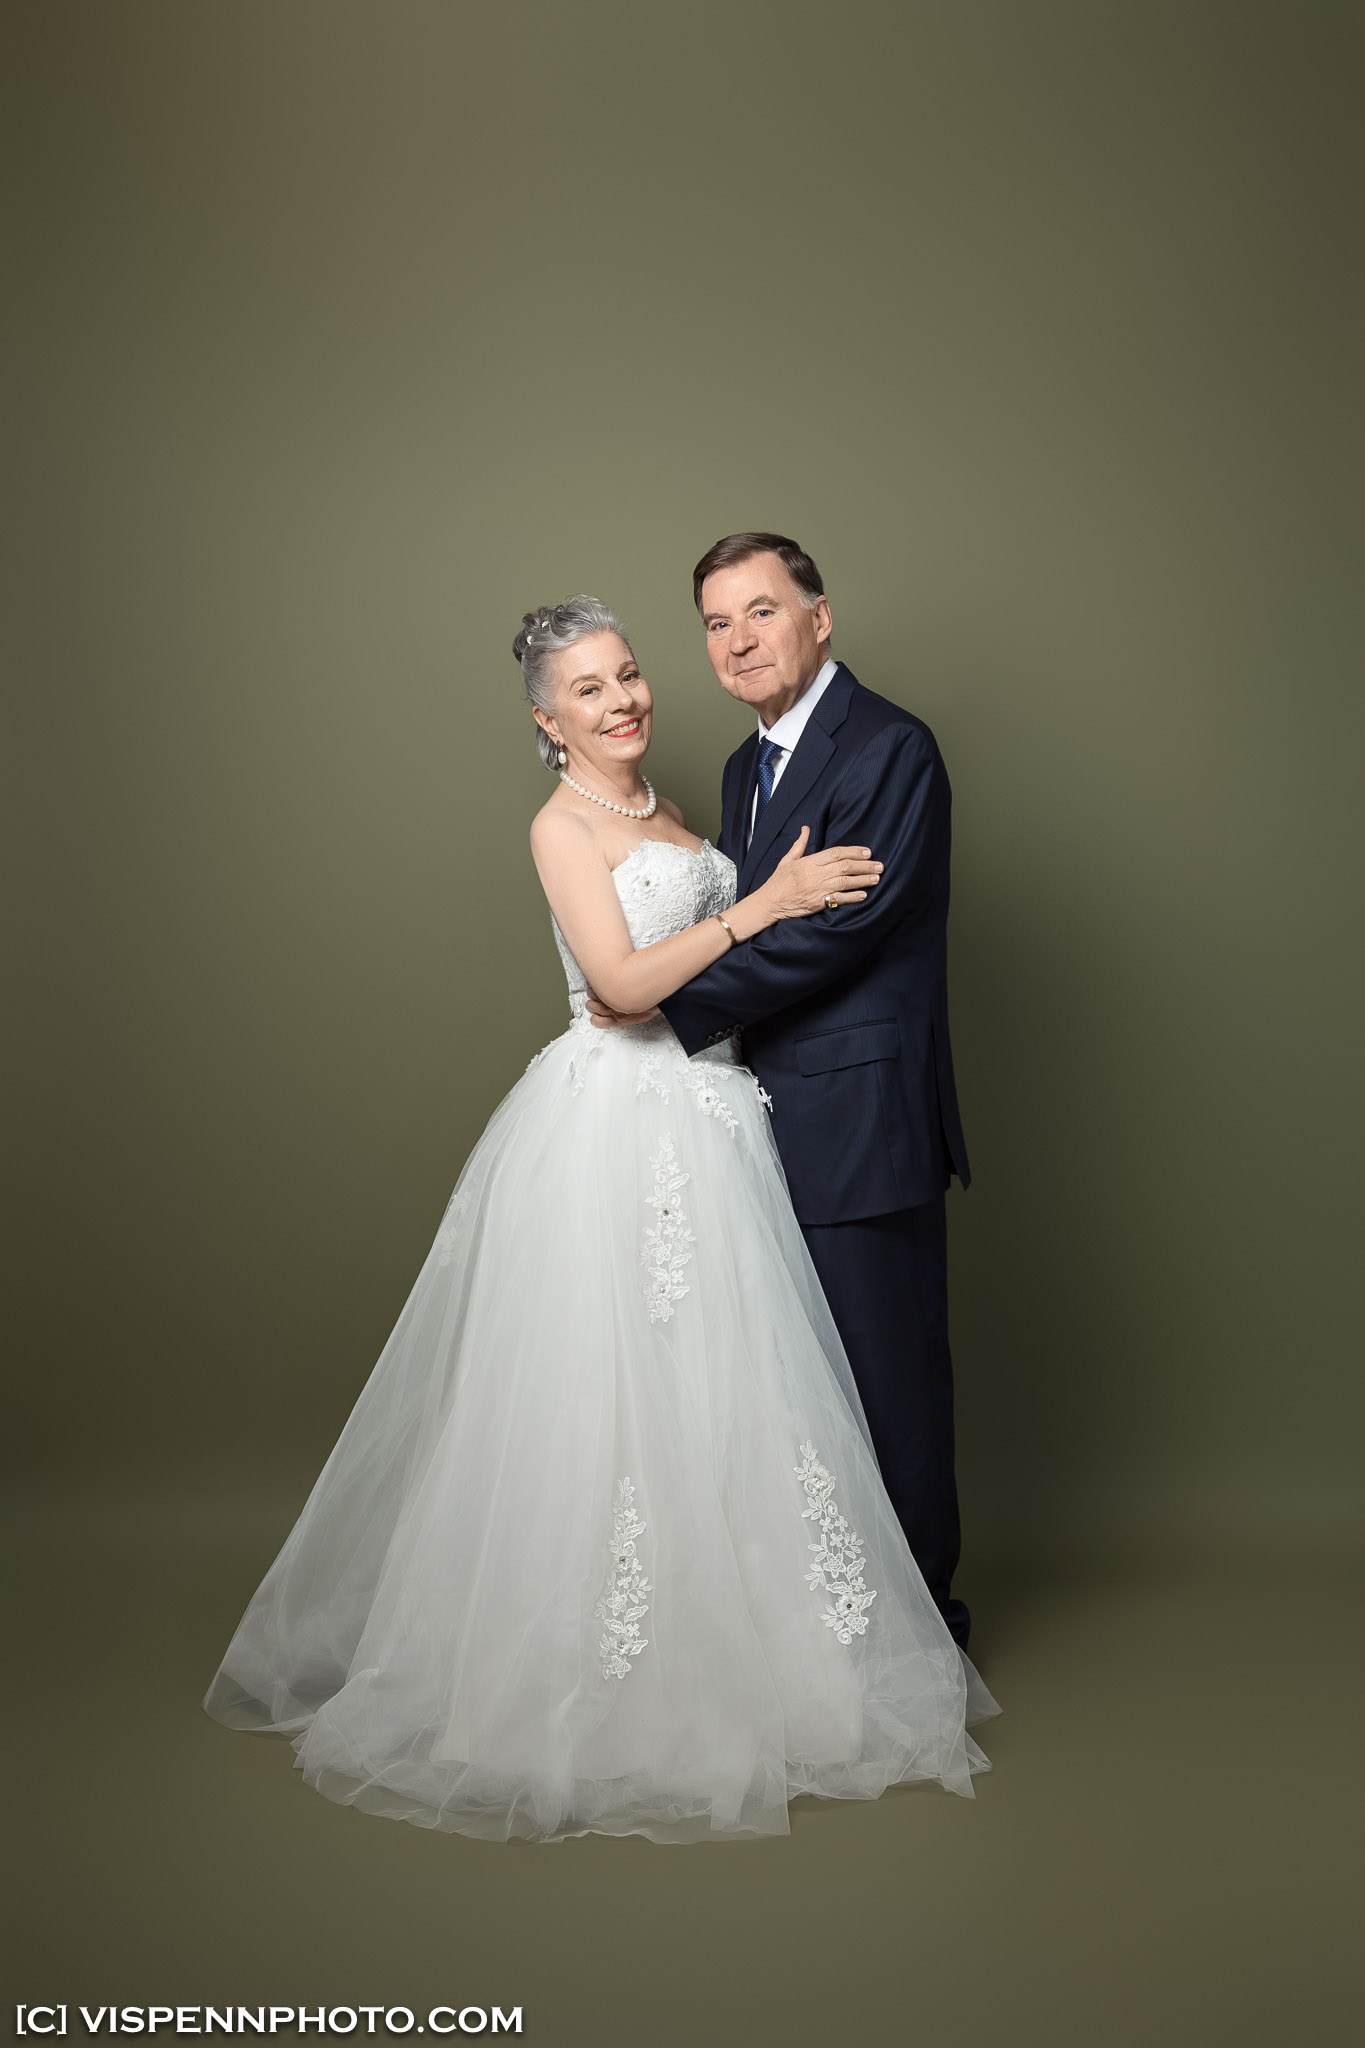 PRE WEDDING Photography Melbourne VISPENN 墨尔本 婚纱照 结婚照 婚纱摄影 Barbara 1075 VISPENN